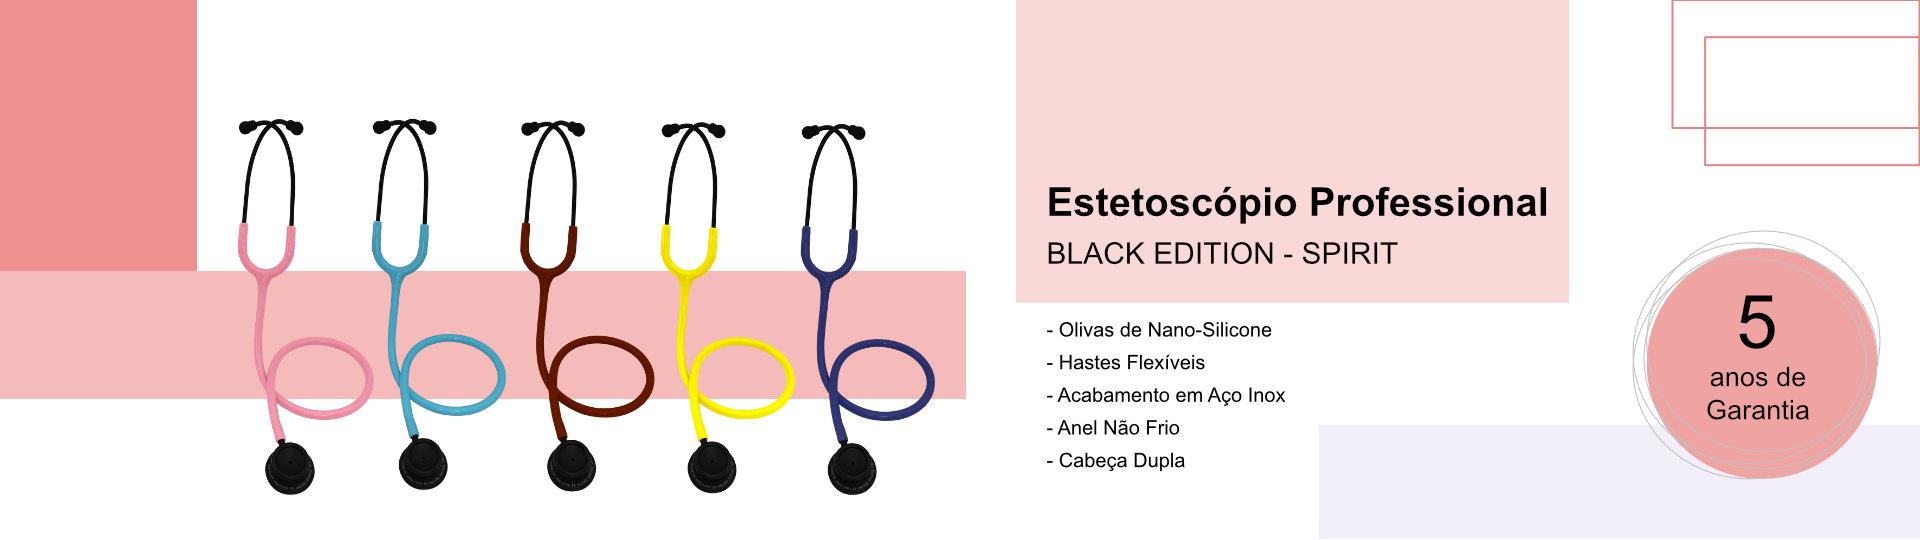 Estetoscópio Professional black edition spirit